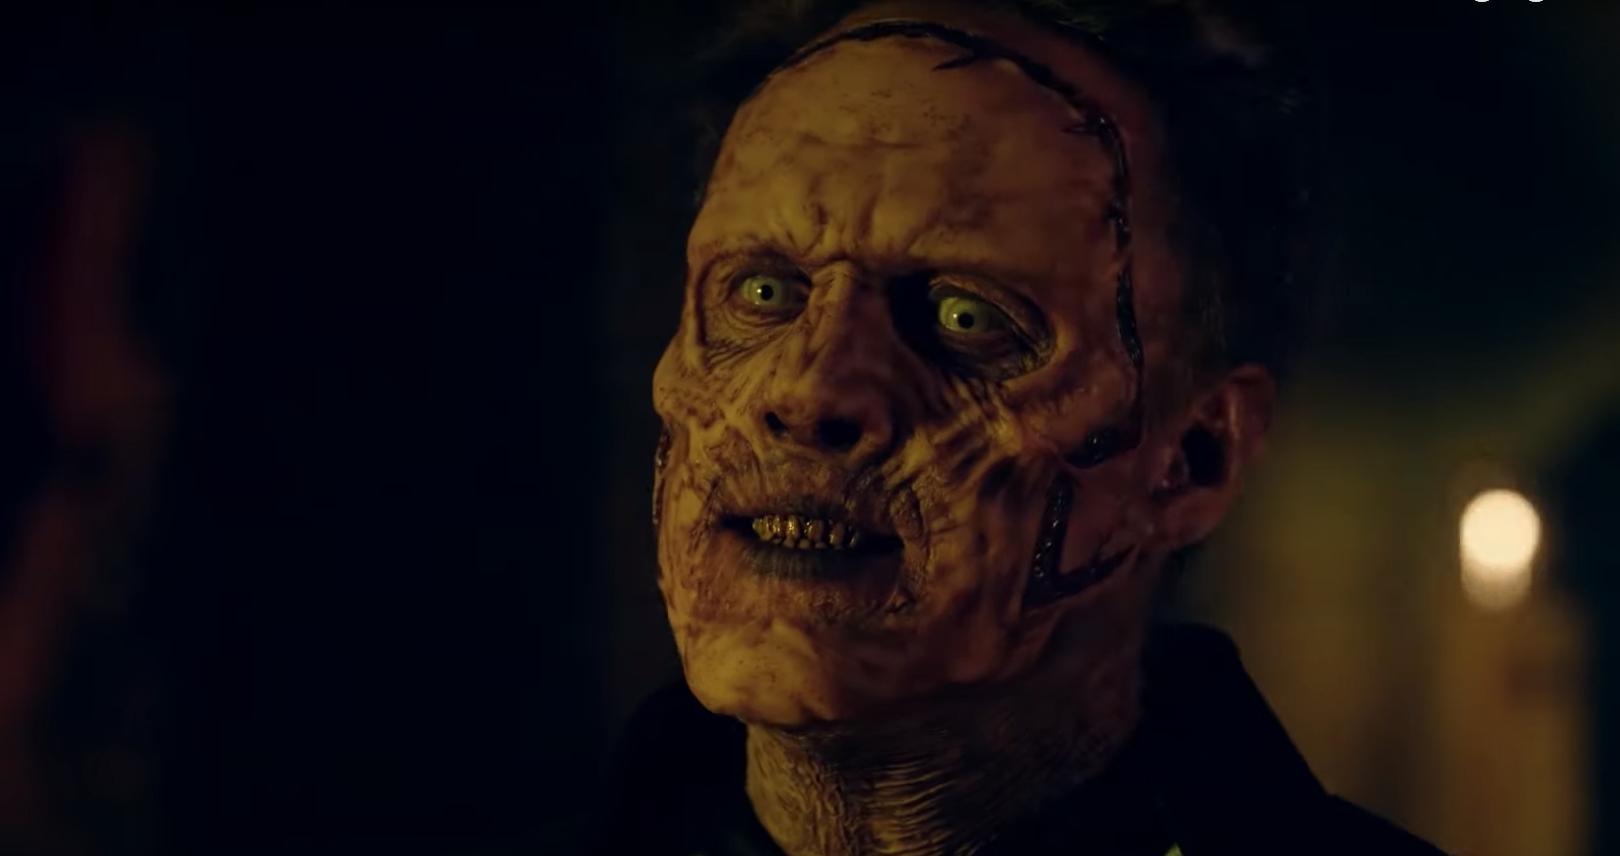 Ben Geurens as The Necromancer on 'Legacies'